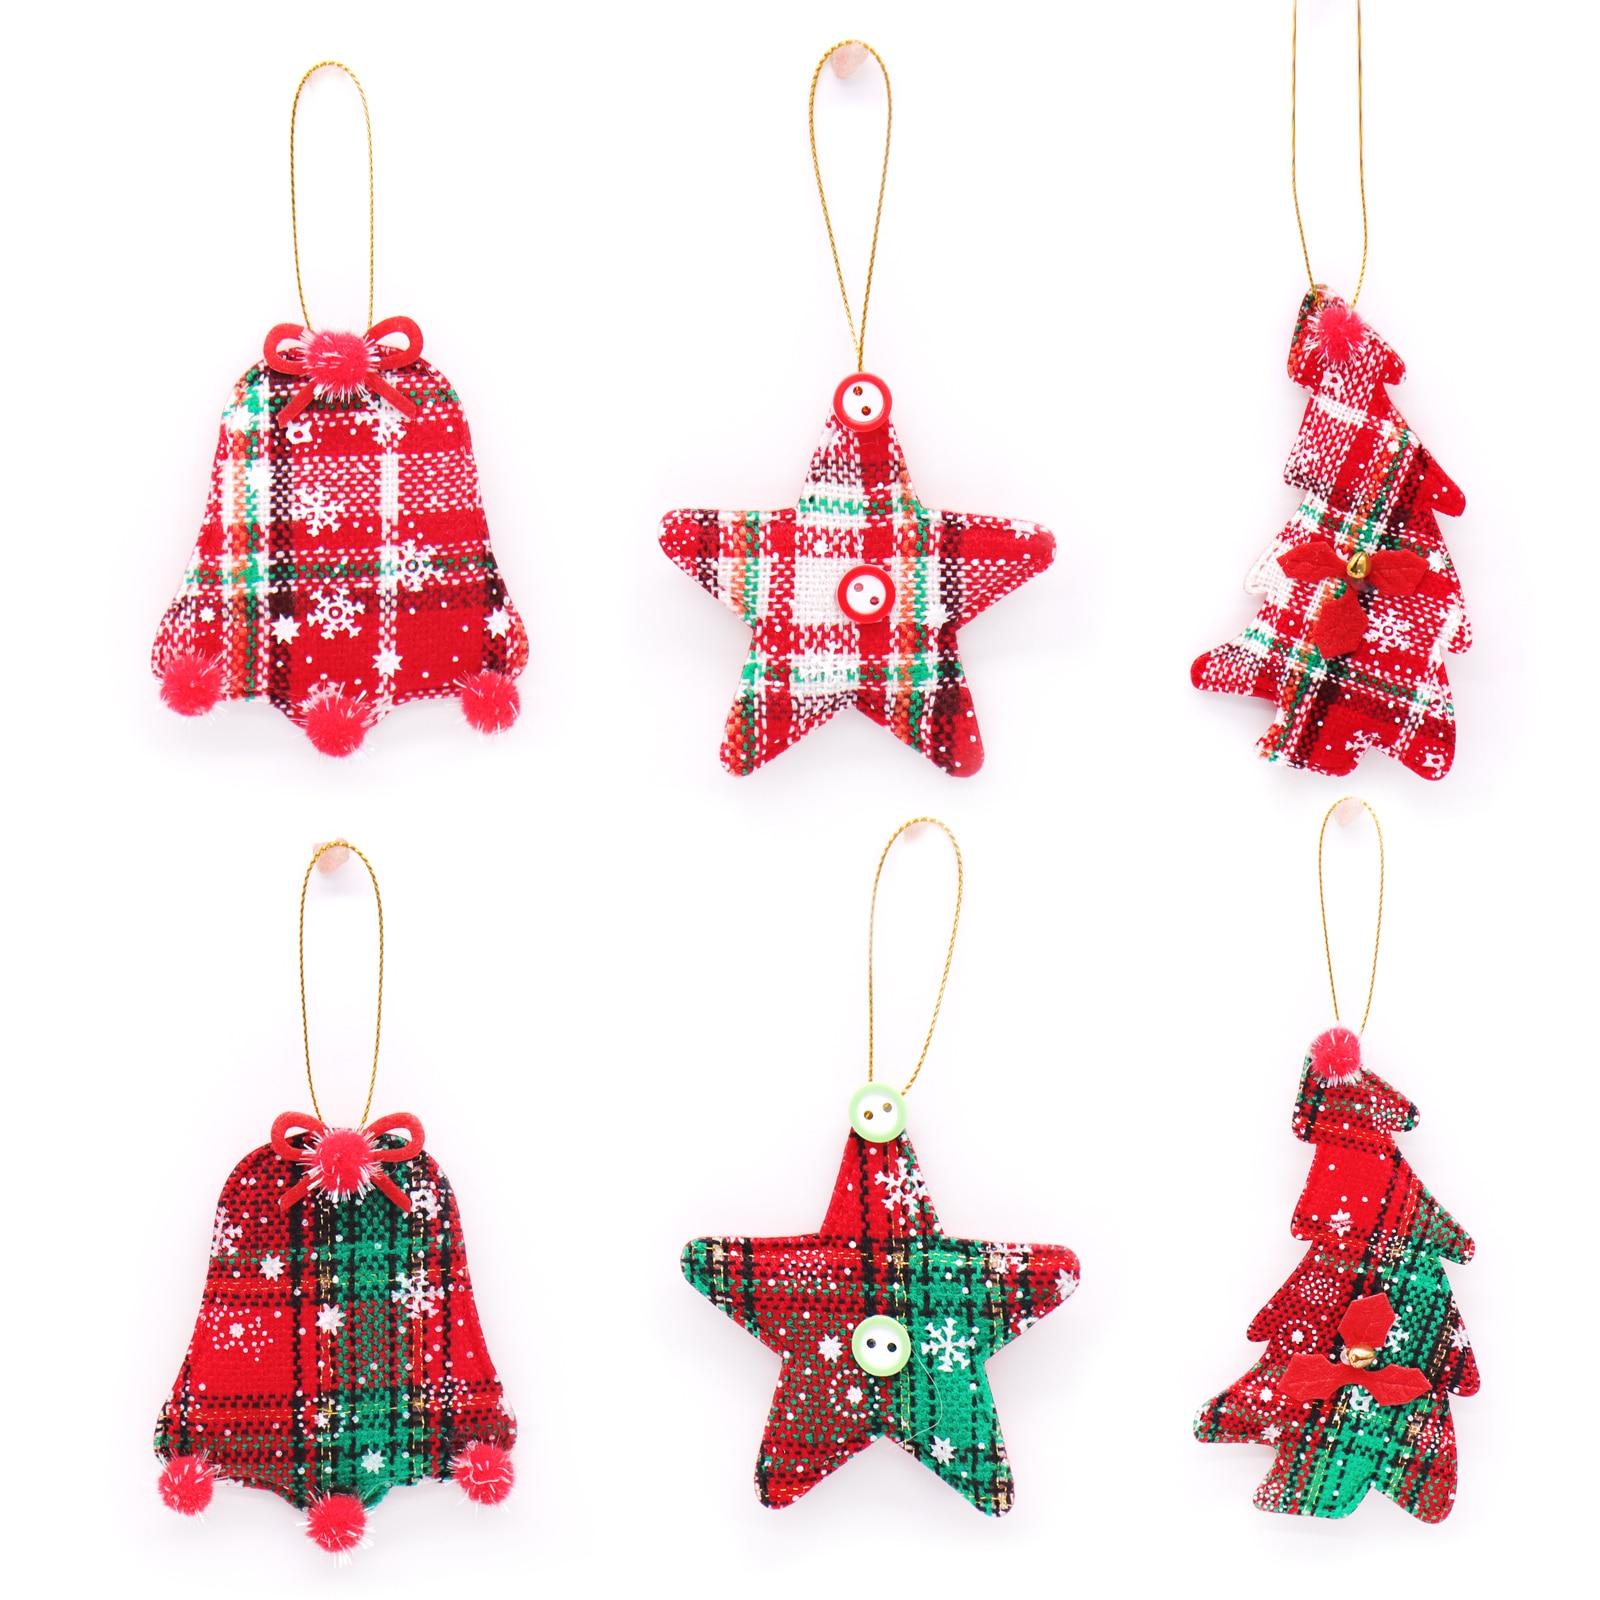 Christmas Tree Decorations Aliexpress: Aliexpress.com : Buy New Red Green Christmas Pendants Xmas